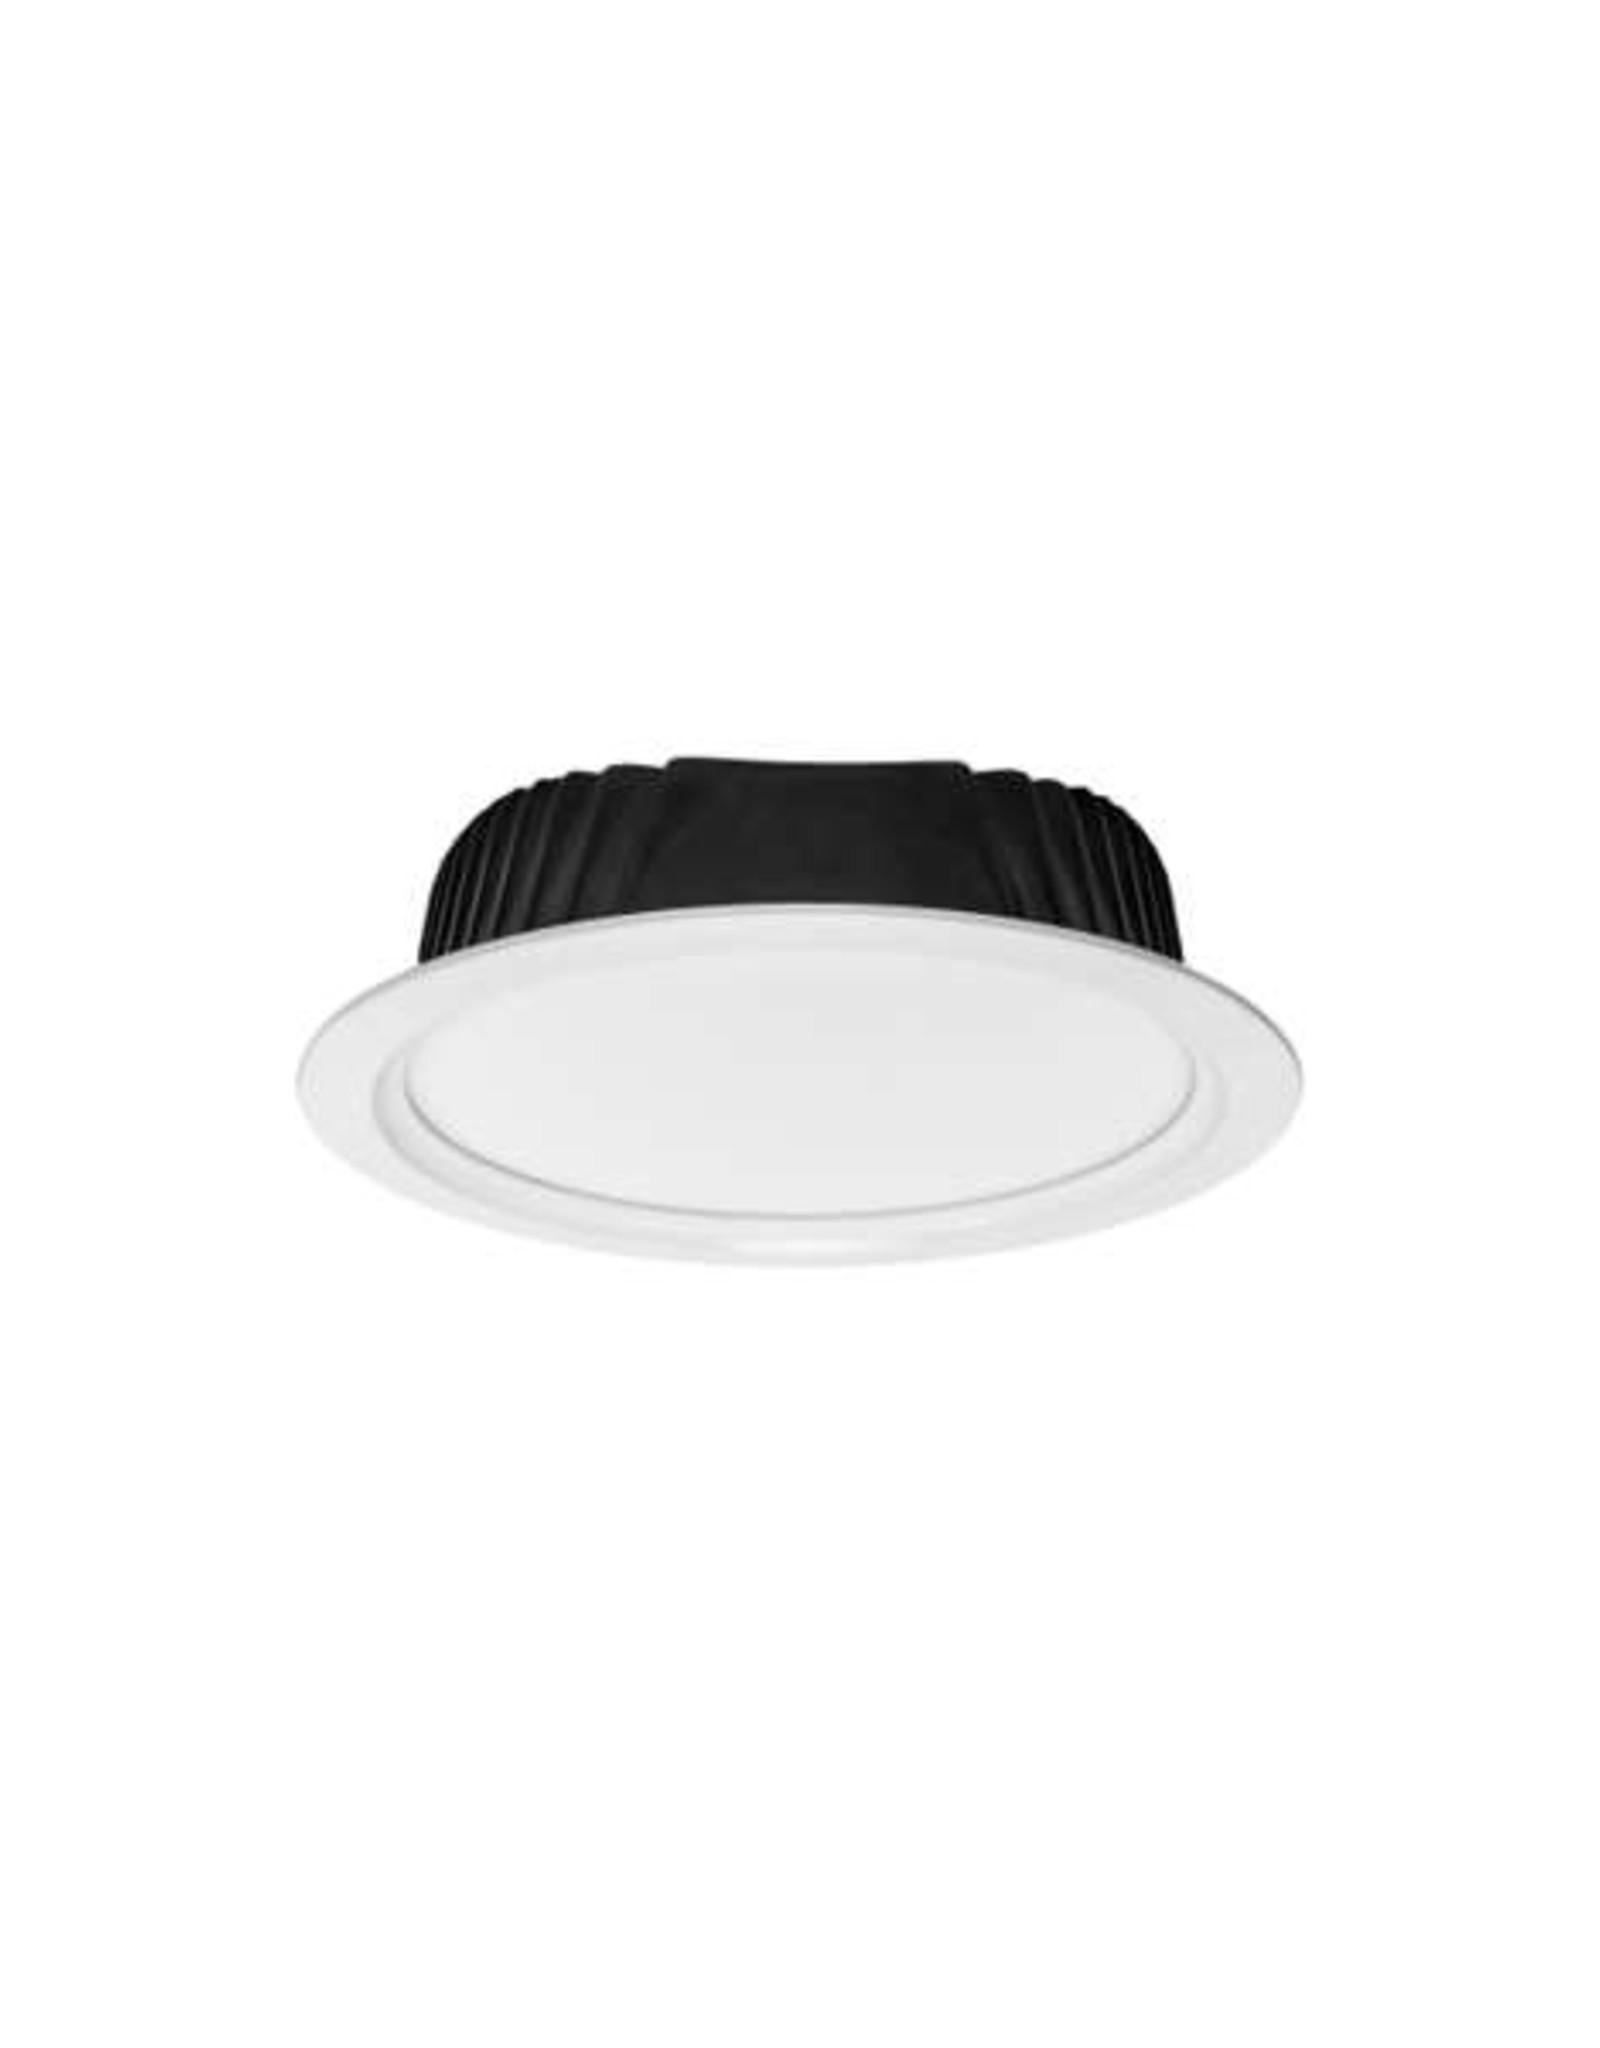 LUXON LED DOWNLIGHT:LED RC 2.0 II - 2750 lm